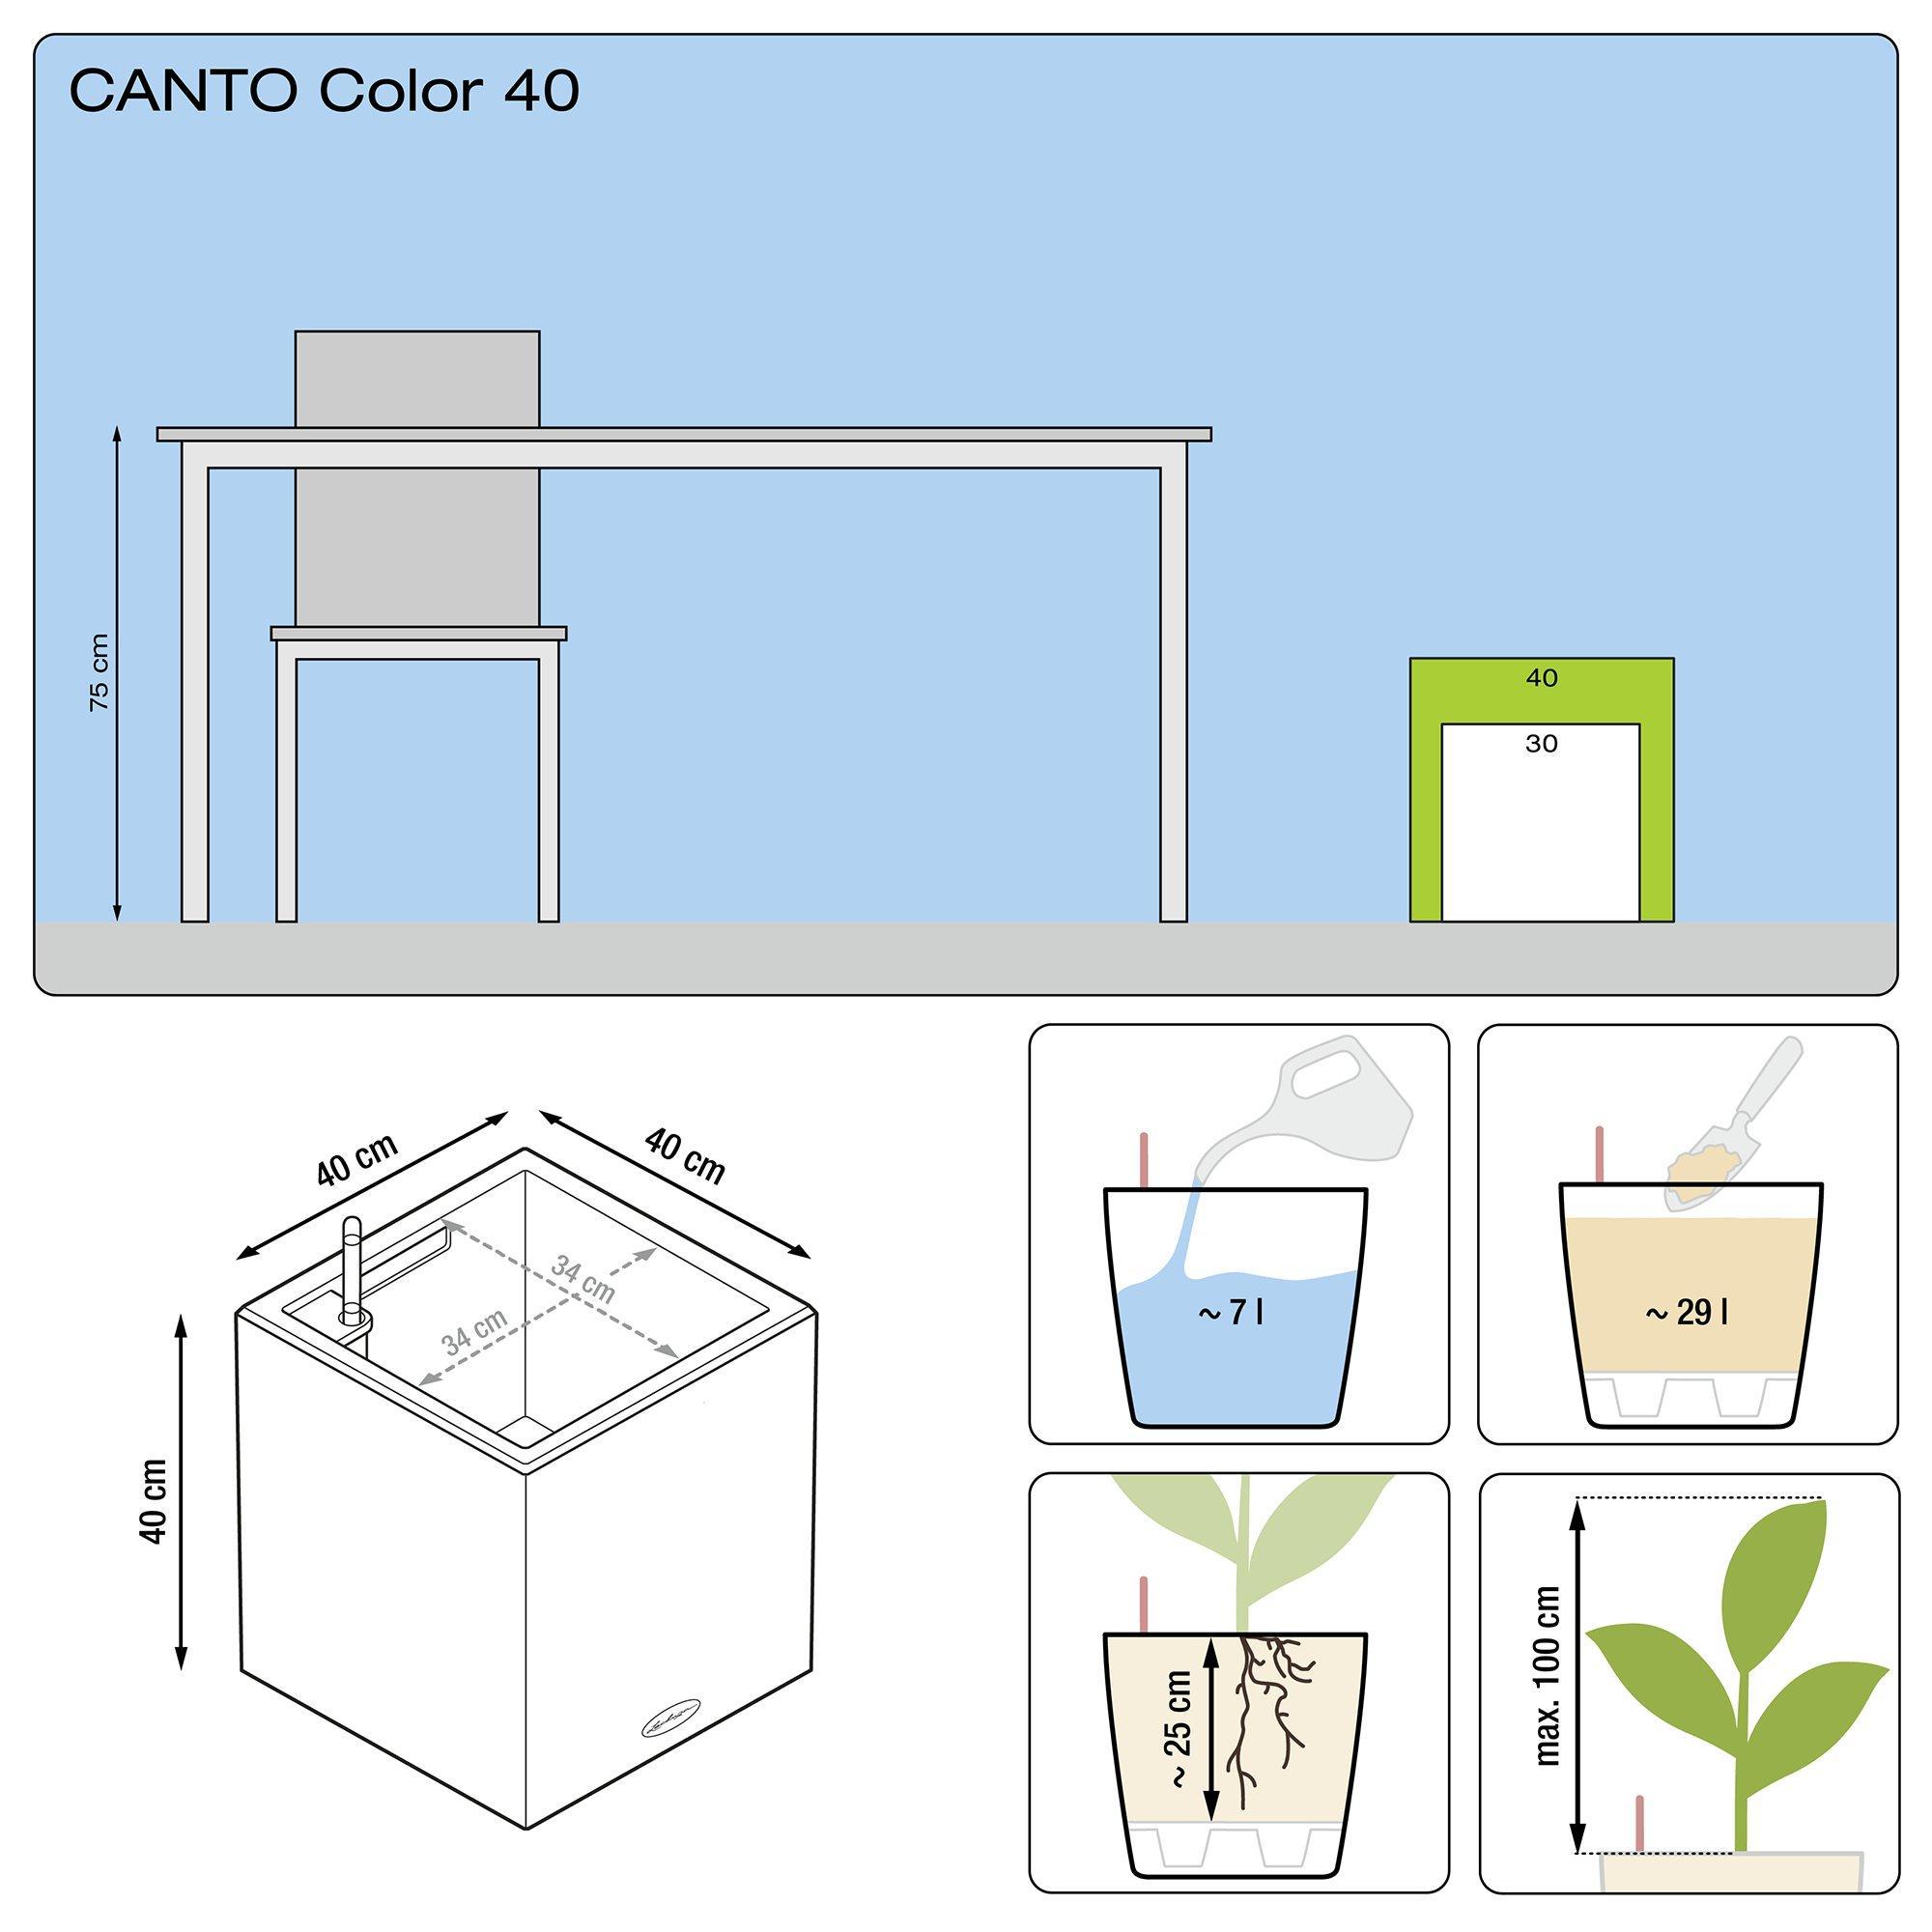 CANTO Color Würfel 40 steingrau - Bild 3